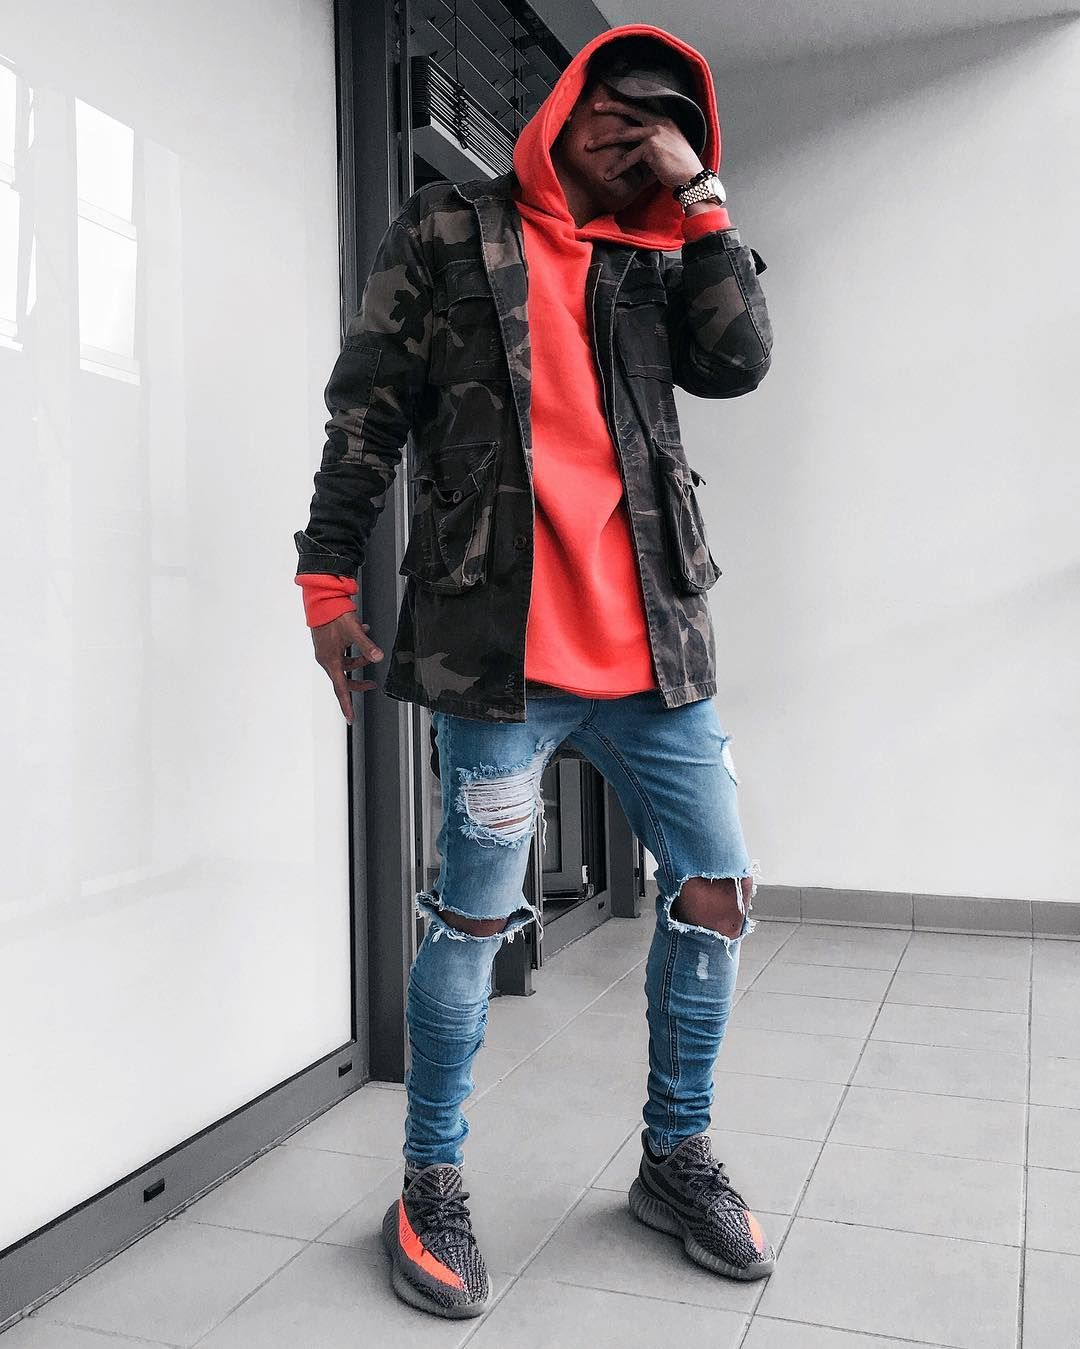 yeezy outfit, mens streetwear